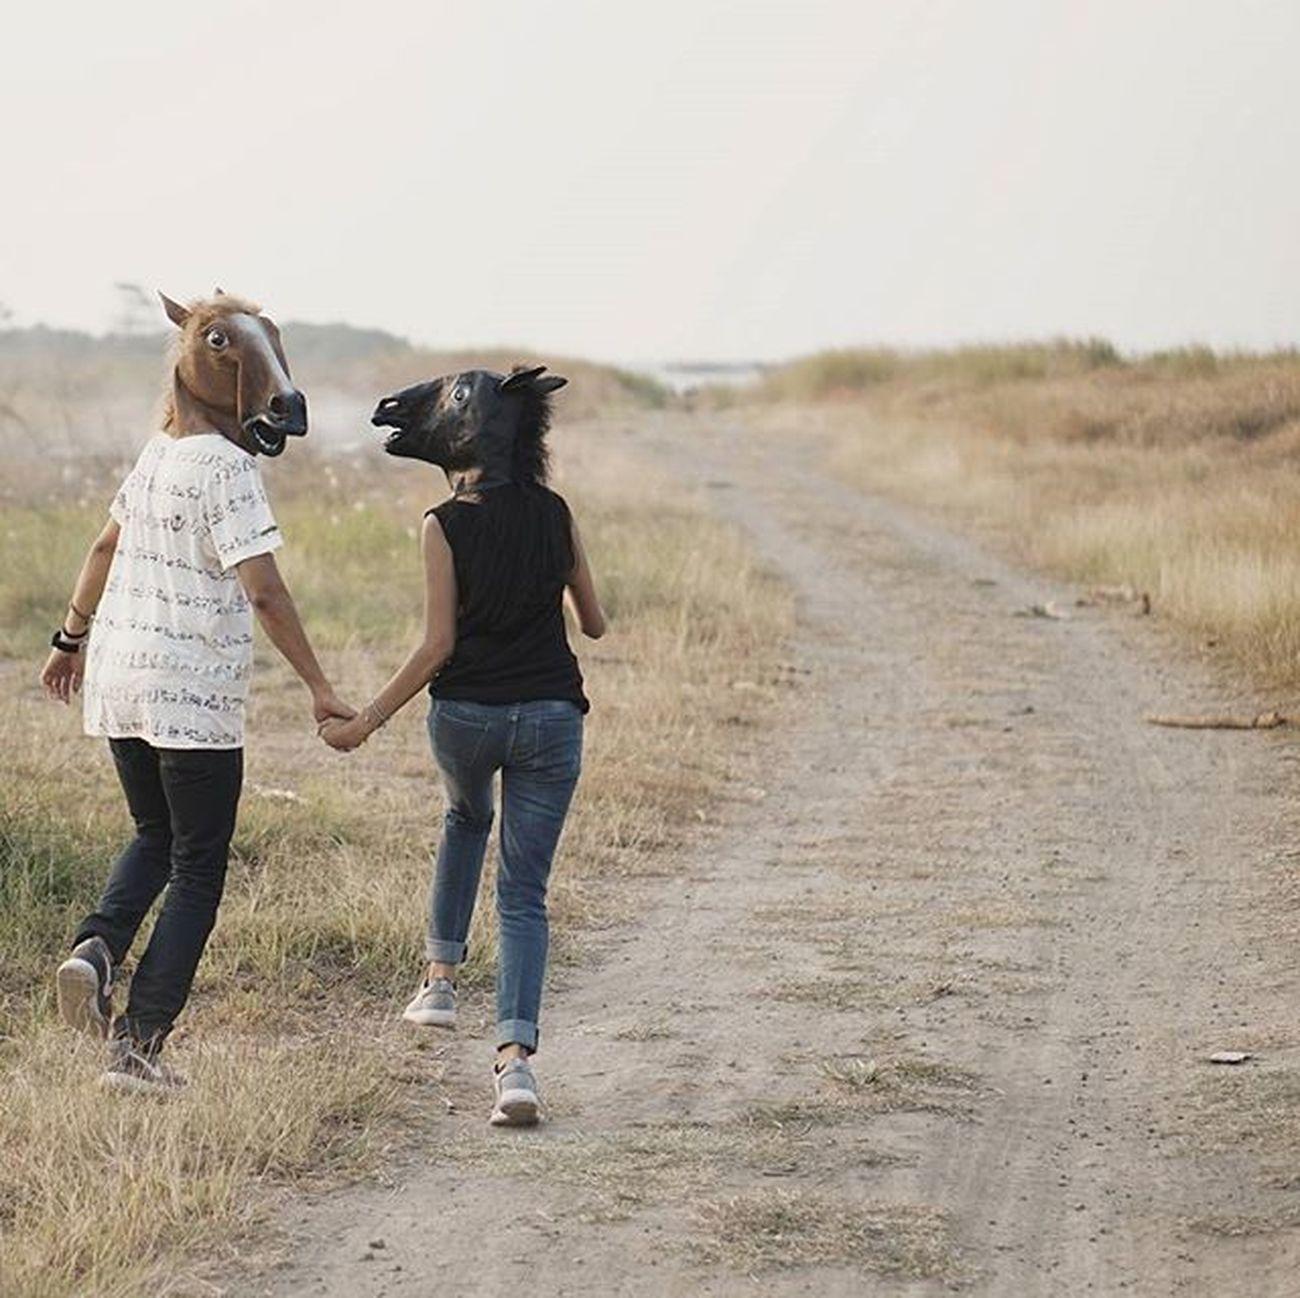 """Where there is love there is life."" Yuk main ke studio @alvinphotography dan ikutan Amazing7ourney Photo Competition ! @karisjayanti @bprianggara @kennybudi @hioe_leonardo @deatandean @janiceanabella @nathanaelivan14 . Alvinphotography Amazing7ourney Shareyourlove Wemakeyouhappy"